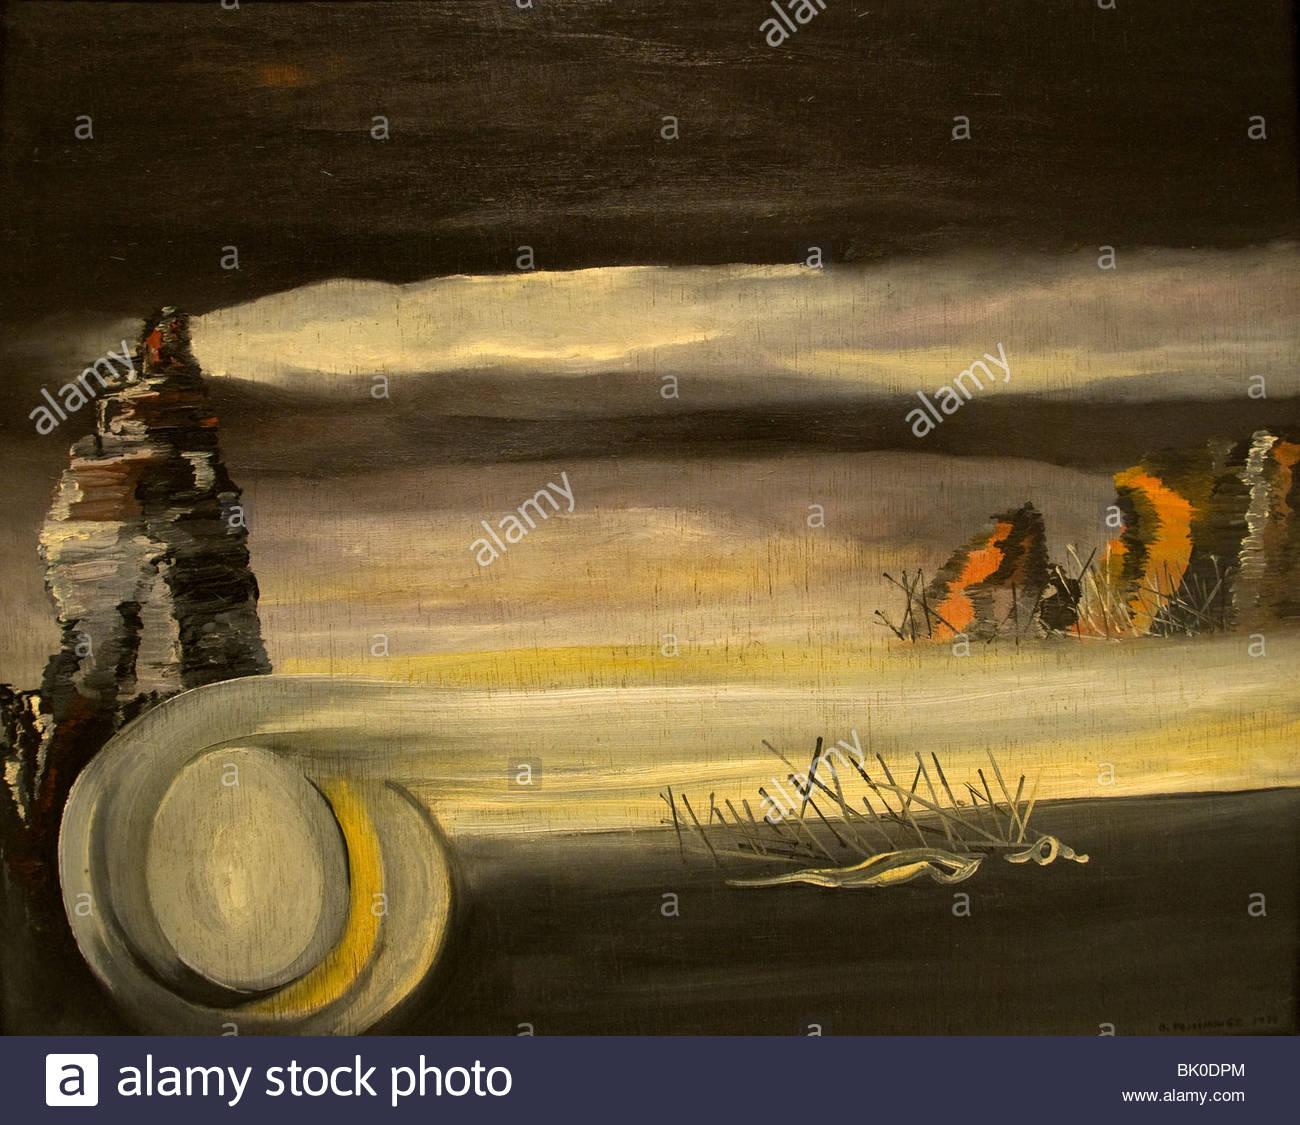 Oscar Dominguez Cosmic Landscape1938 Spain Spanish Painter - Stock Image